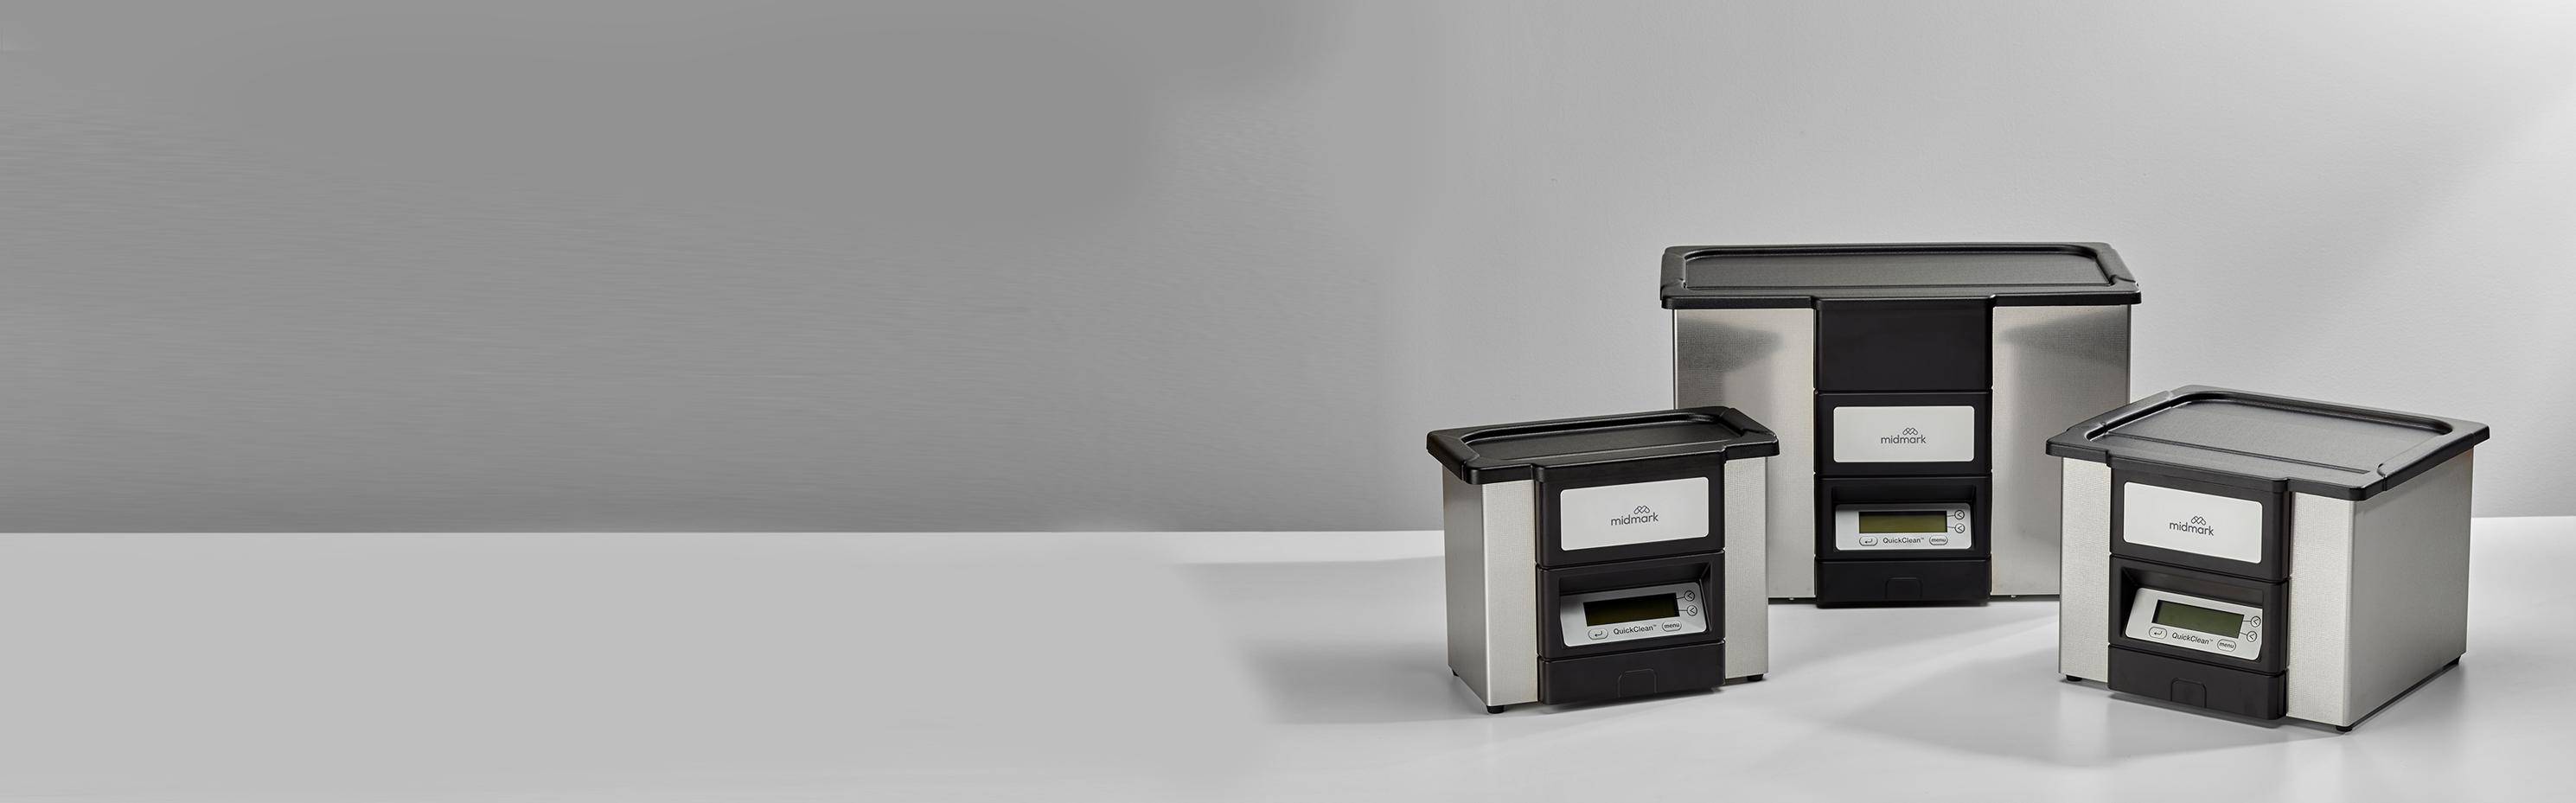 ultrasonic-cleaners-header-desktop